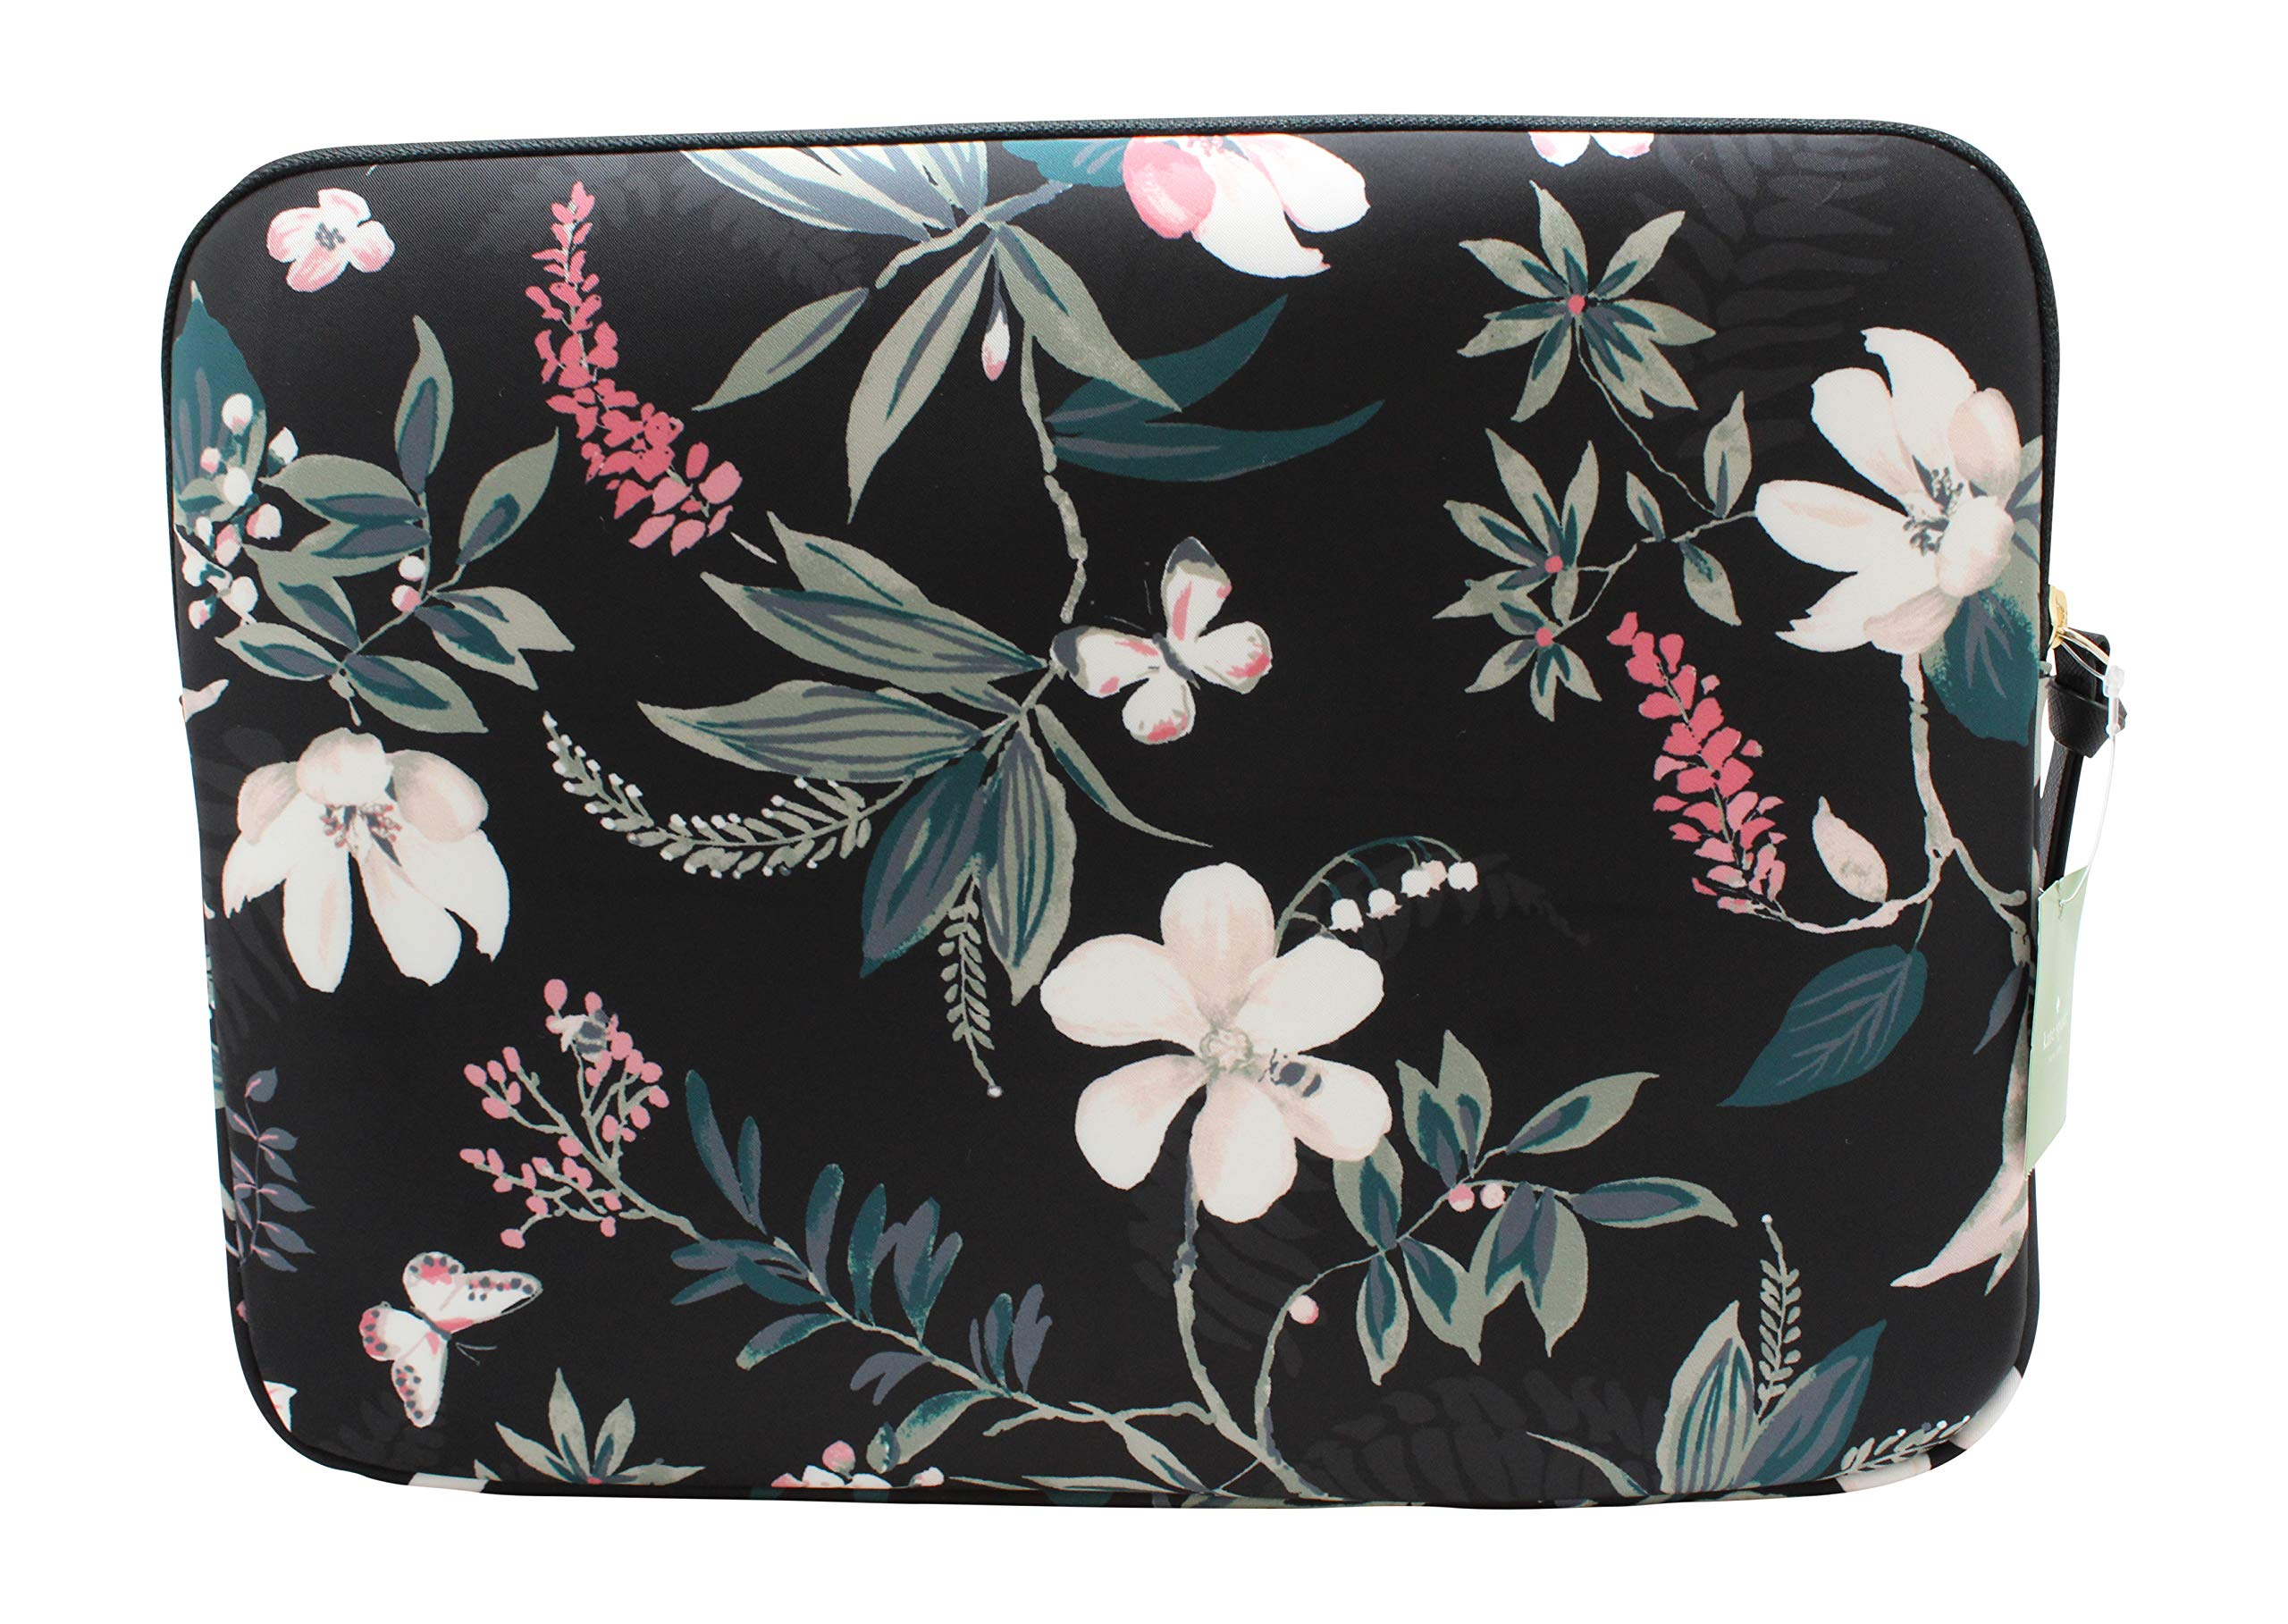 Kate Spade Wilson Rd Botanical Laptop Case Sleeve Black Multi 13'' by Kate Spade New York (Image #3)